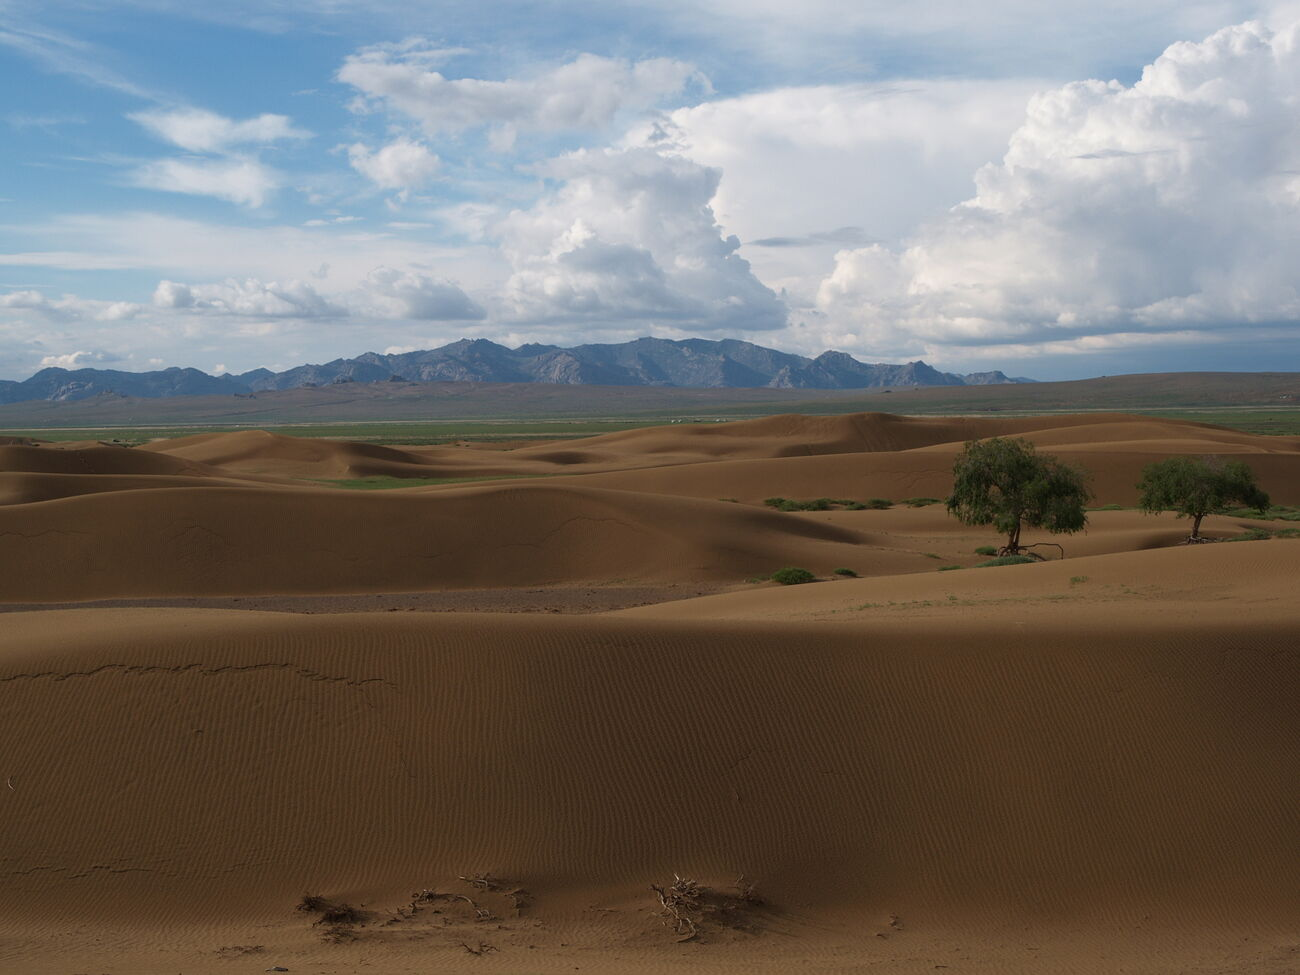 Sand Dunes Camels Monasteries Mongolia